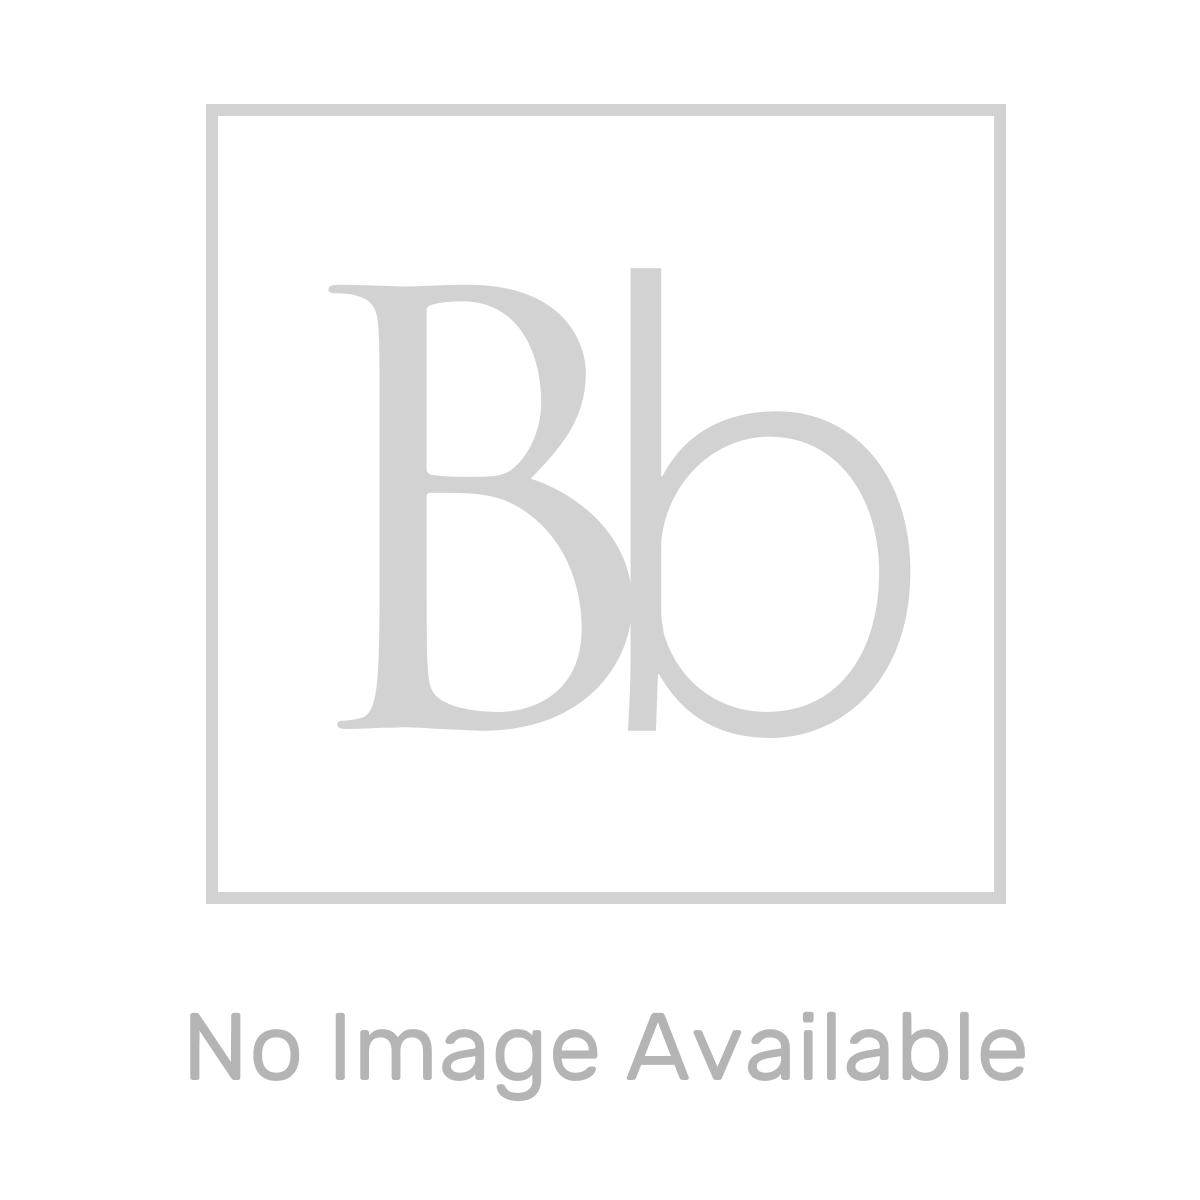 Frontline Standard Rectanglular Shower Tray 1100 x 760mm